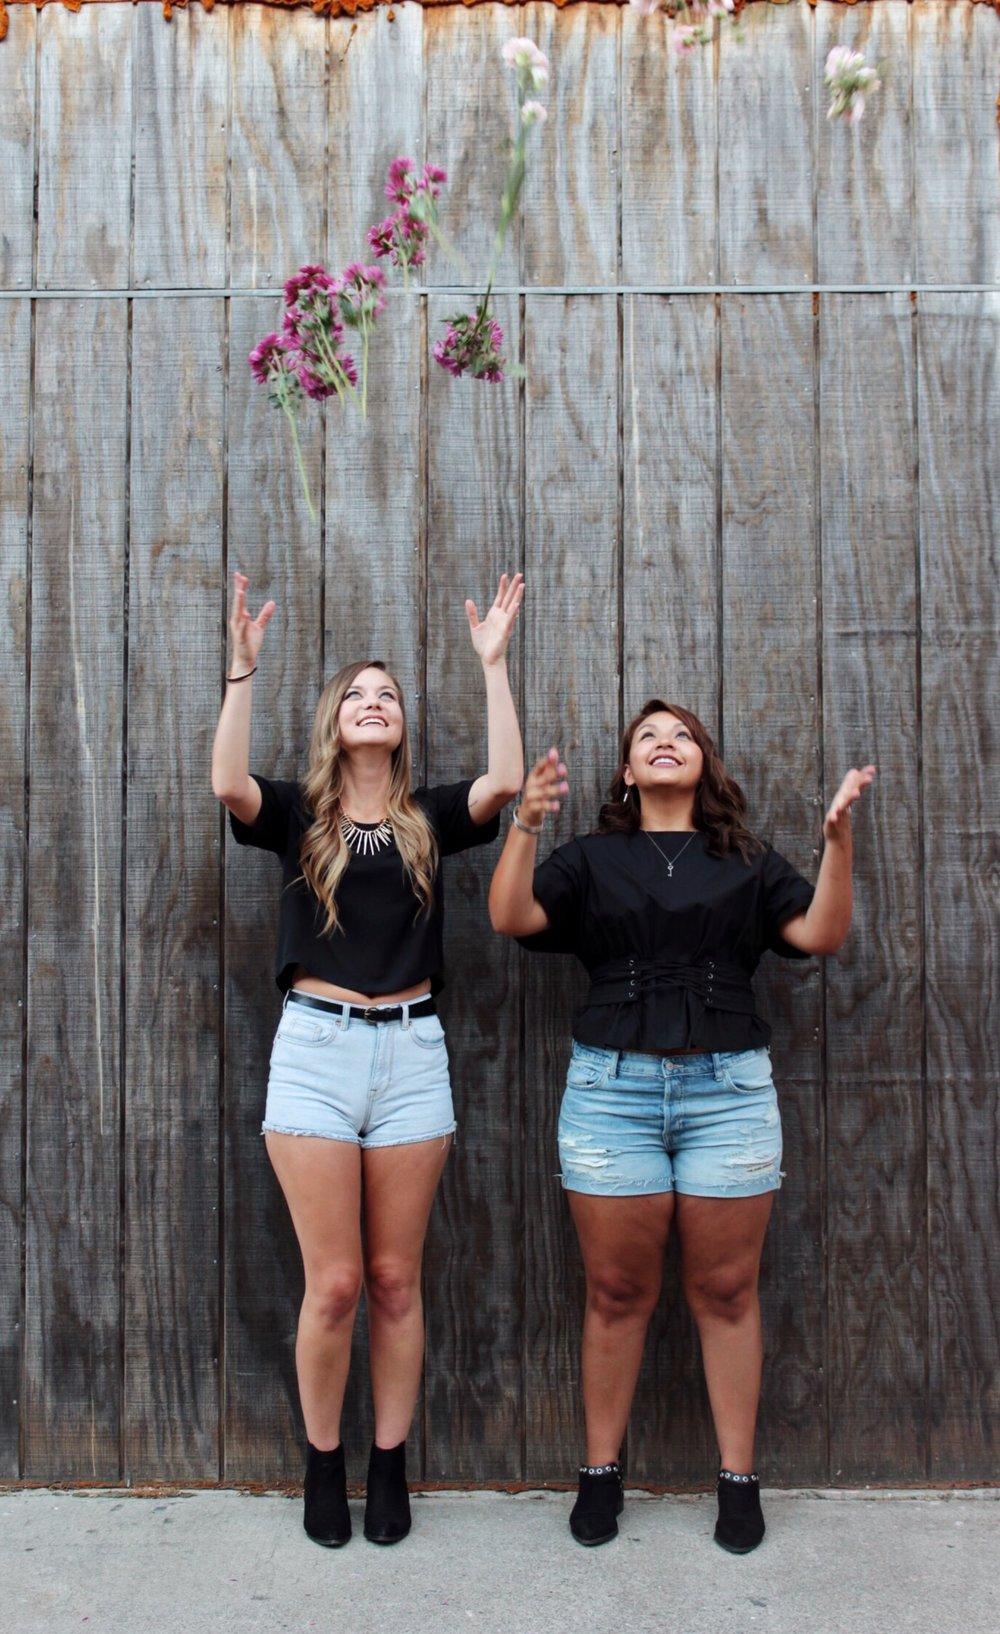 Throwing Carnation Flowers. Women's Denim Shorts and Basic Black Tops.